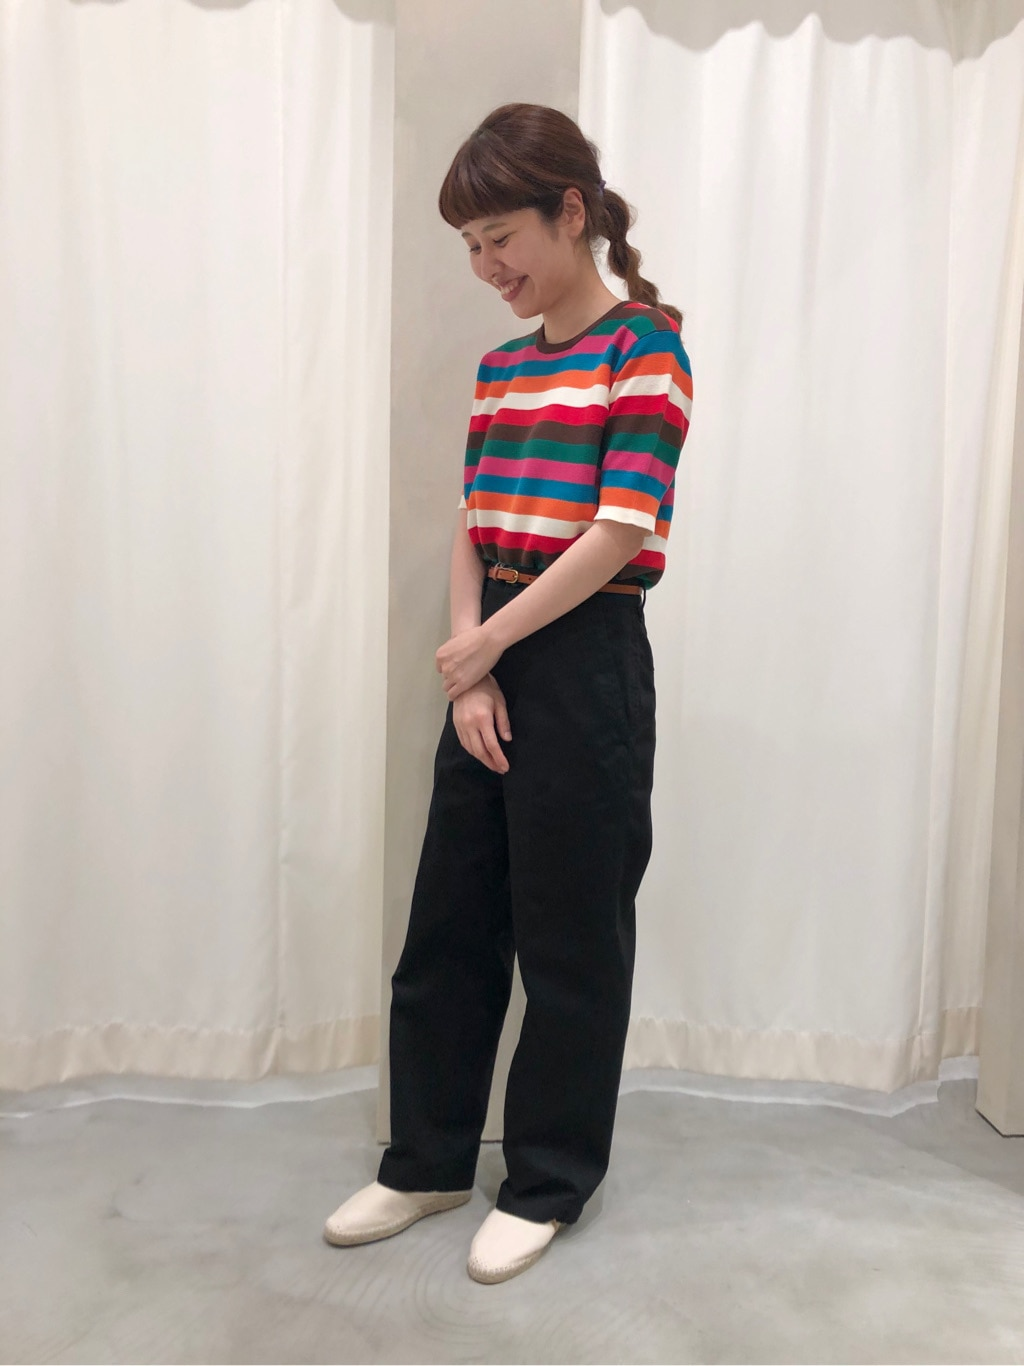 CHILD WOMAN , PAR ICI 東京スカイツリータウン・ソラマチ 2020.07.07